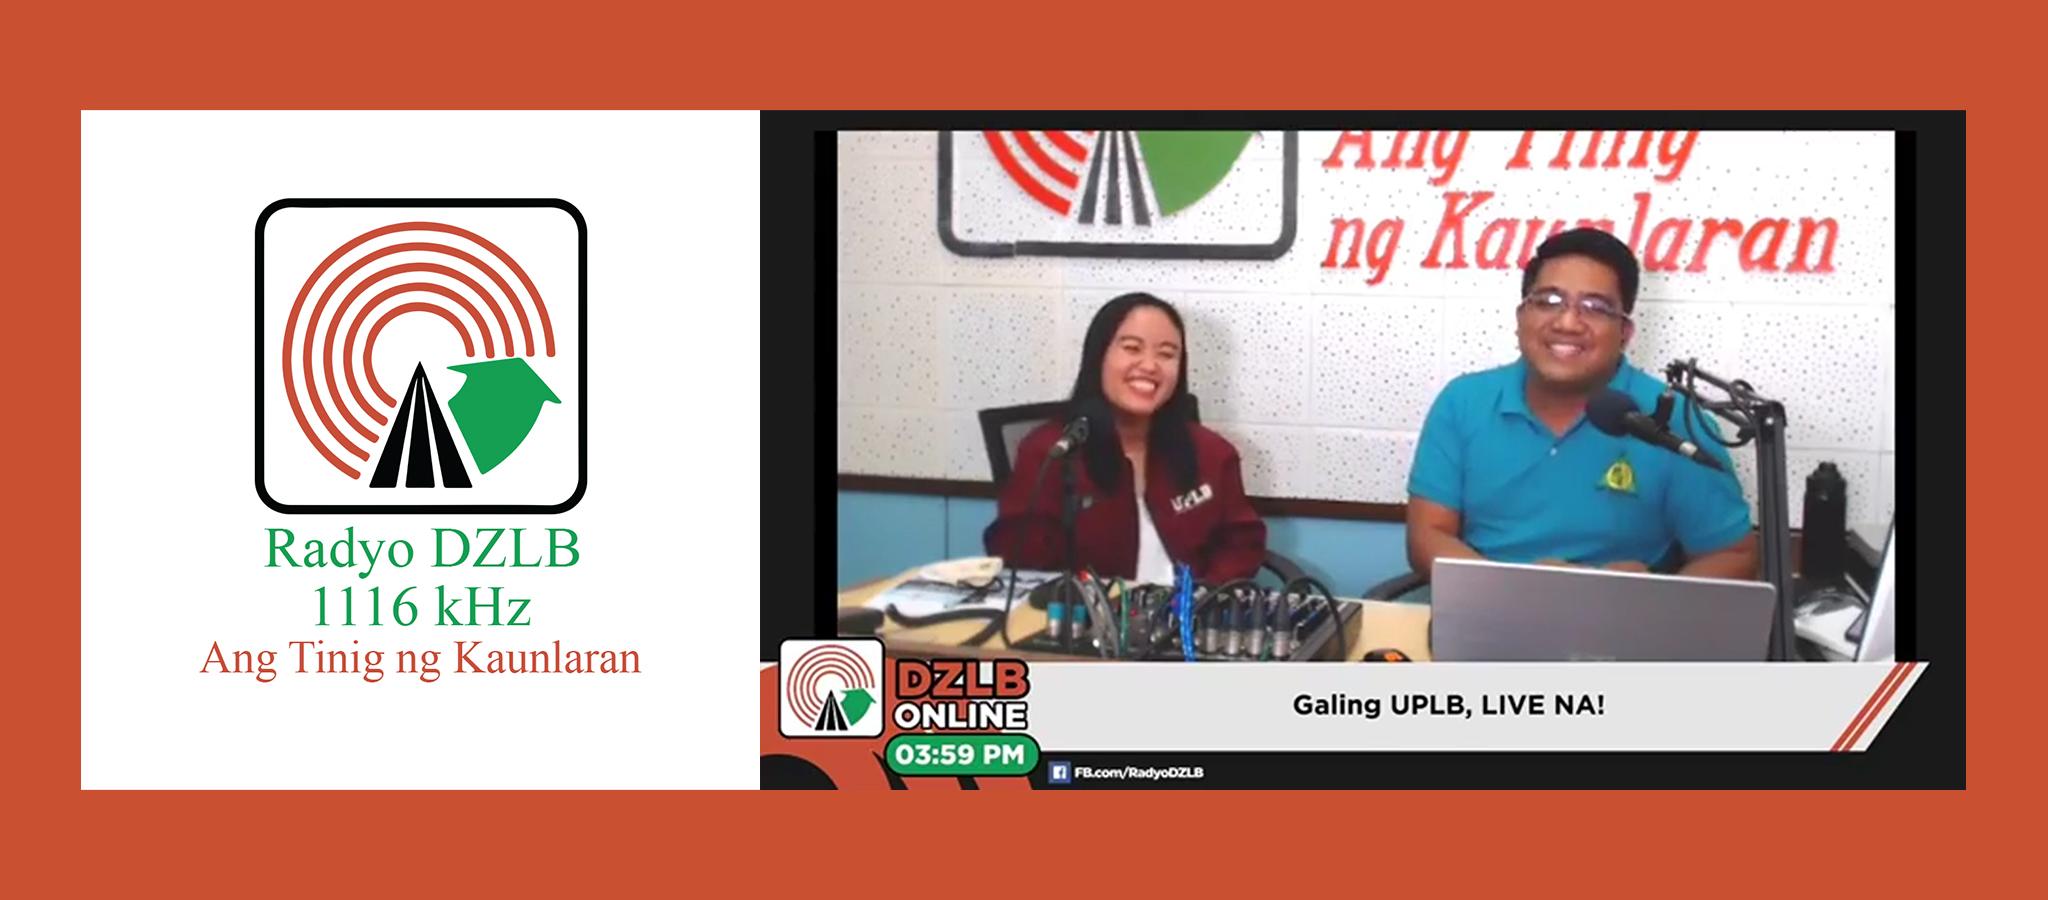 Public service, technology, and development kick off Galing UPLB Season 2